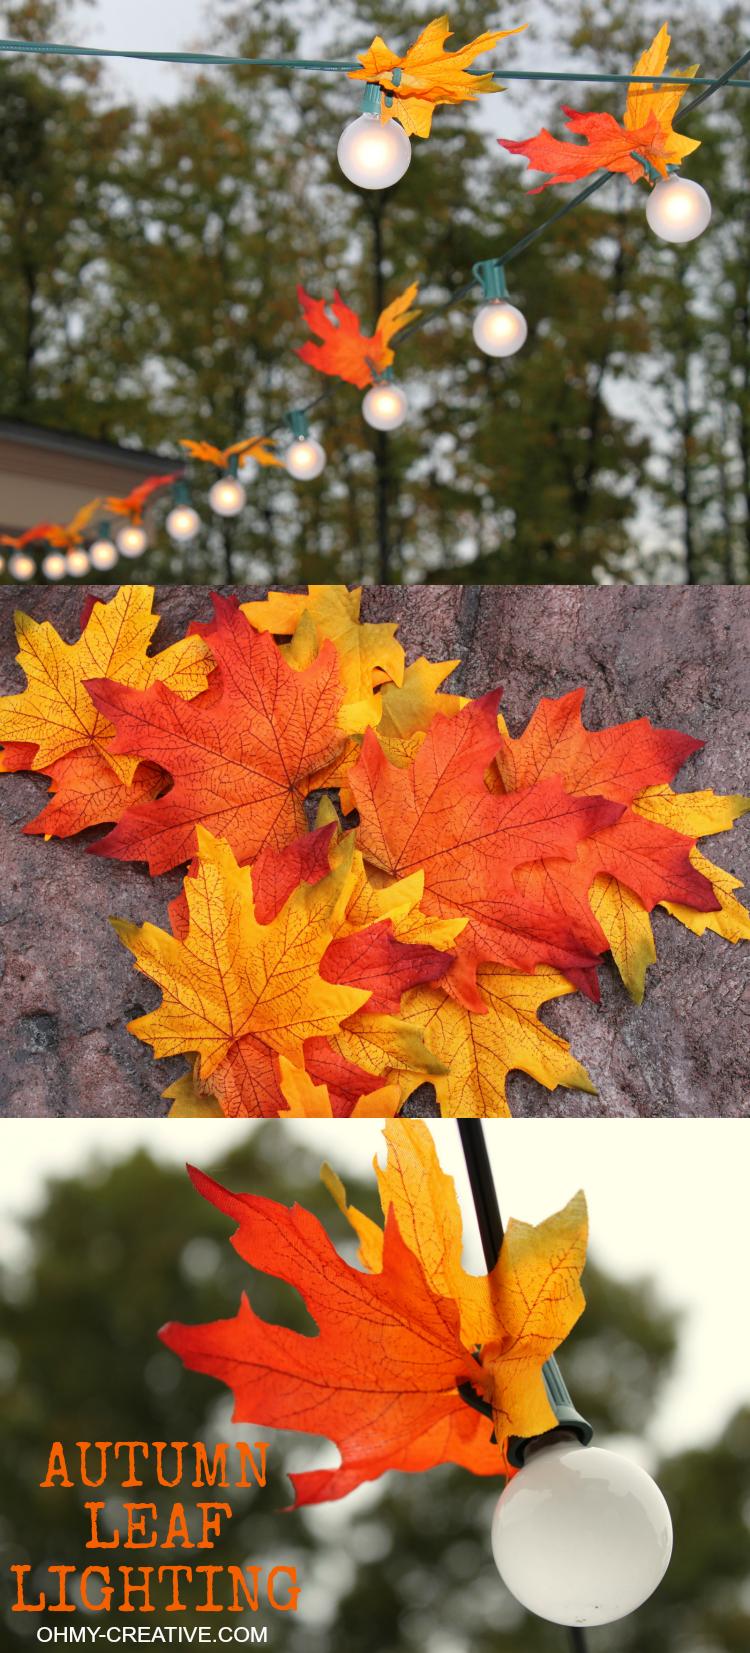 Autumn Leaf Lighting Oh My Creative